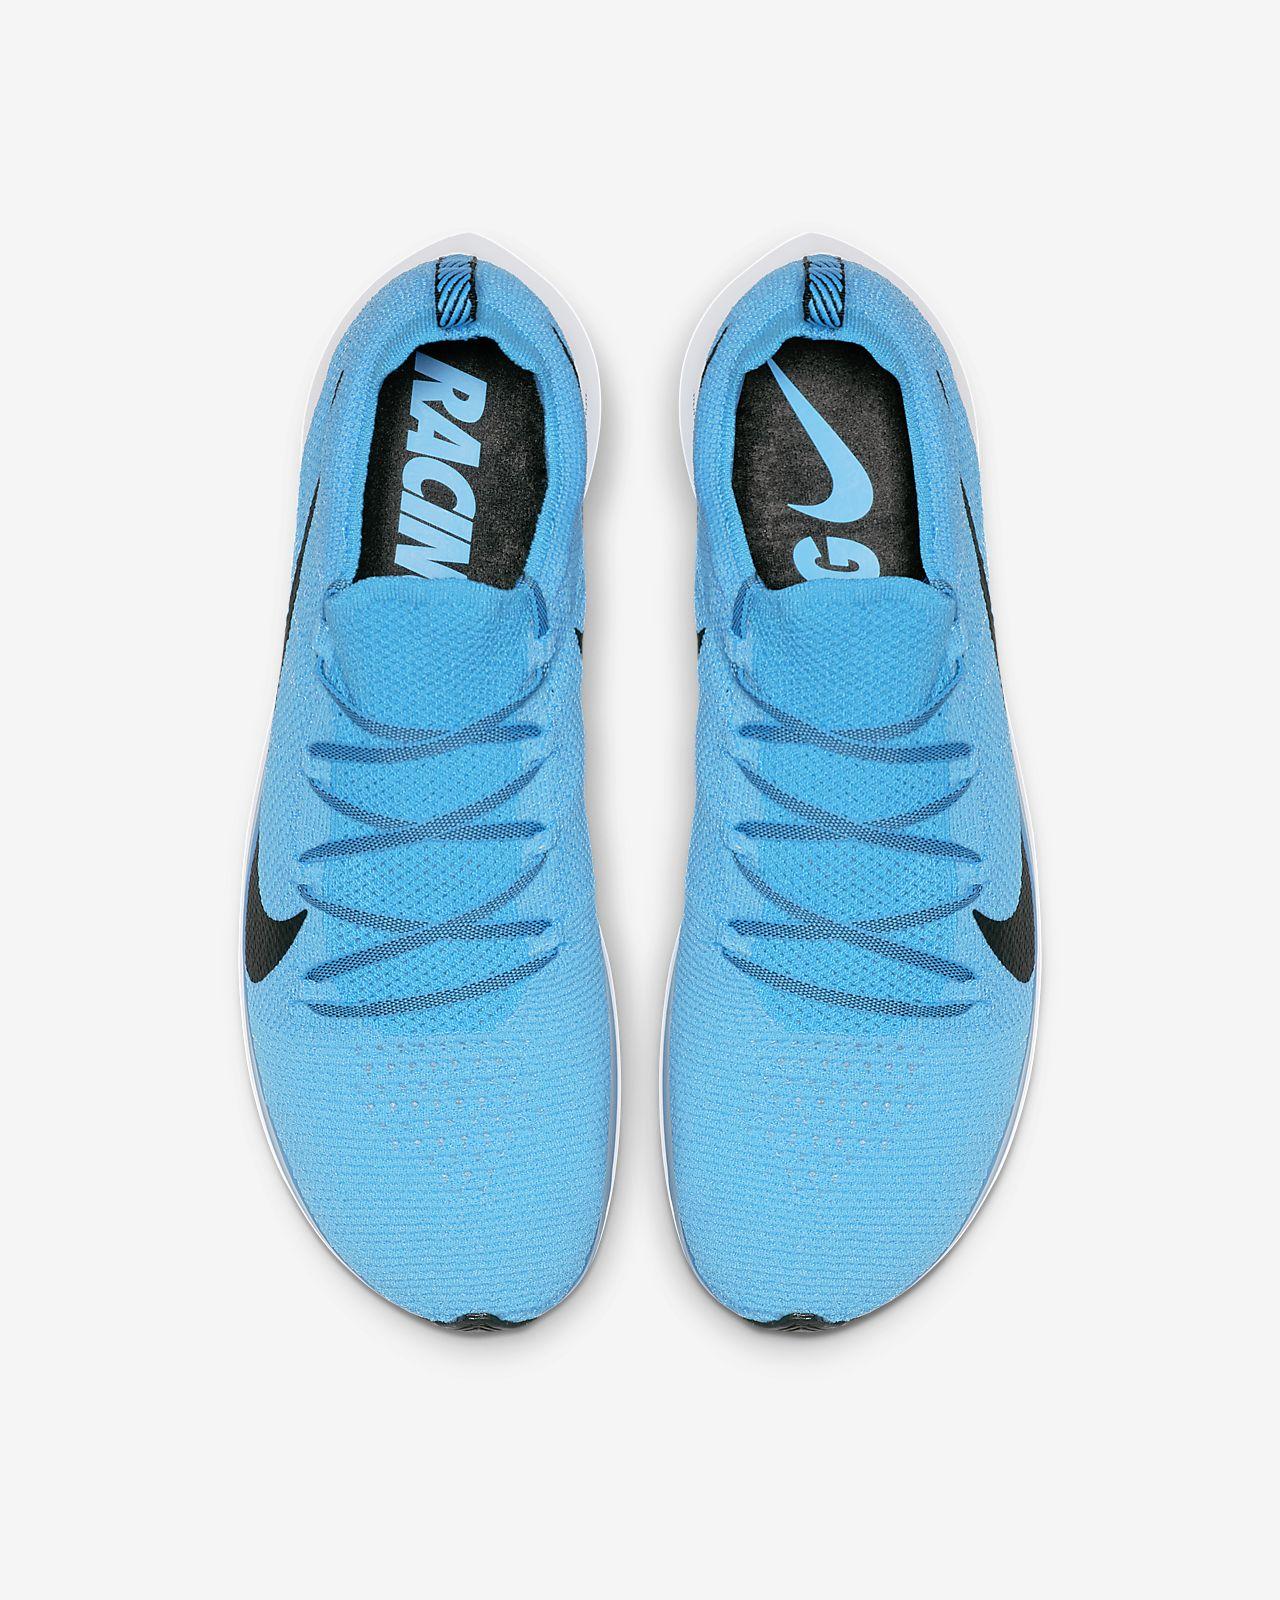 9abe9969146c Nike Zoom Fly Flyknit Men s Running Shoe. Nike.com AU